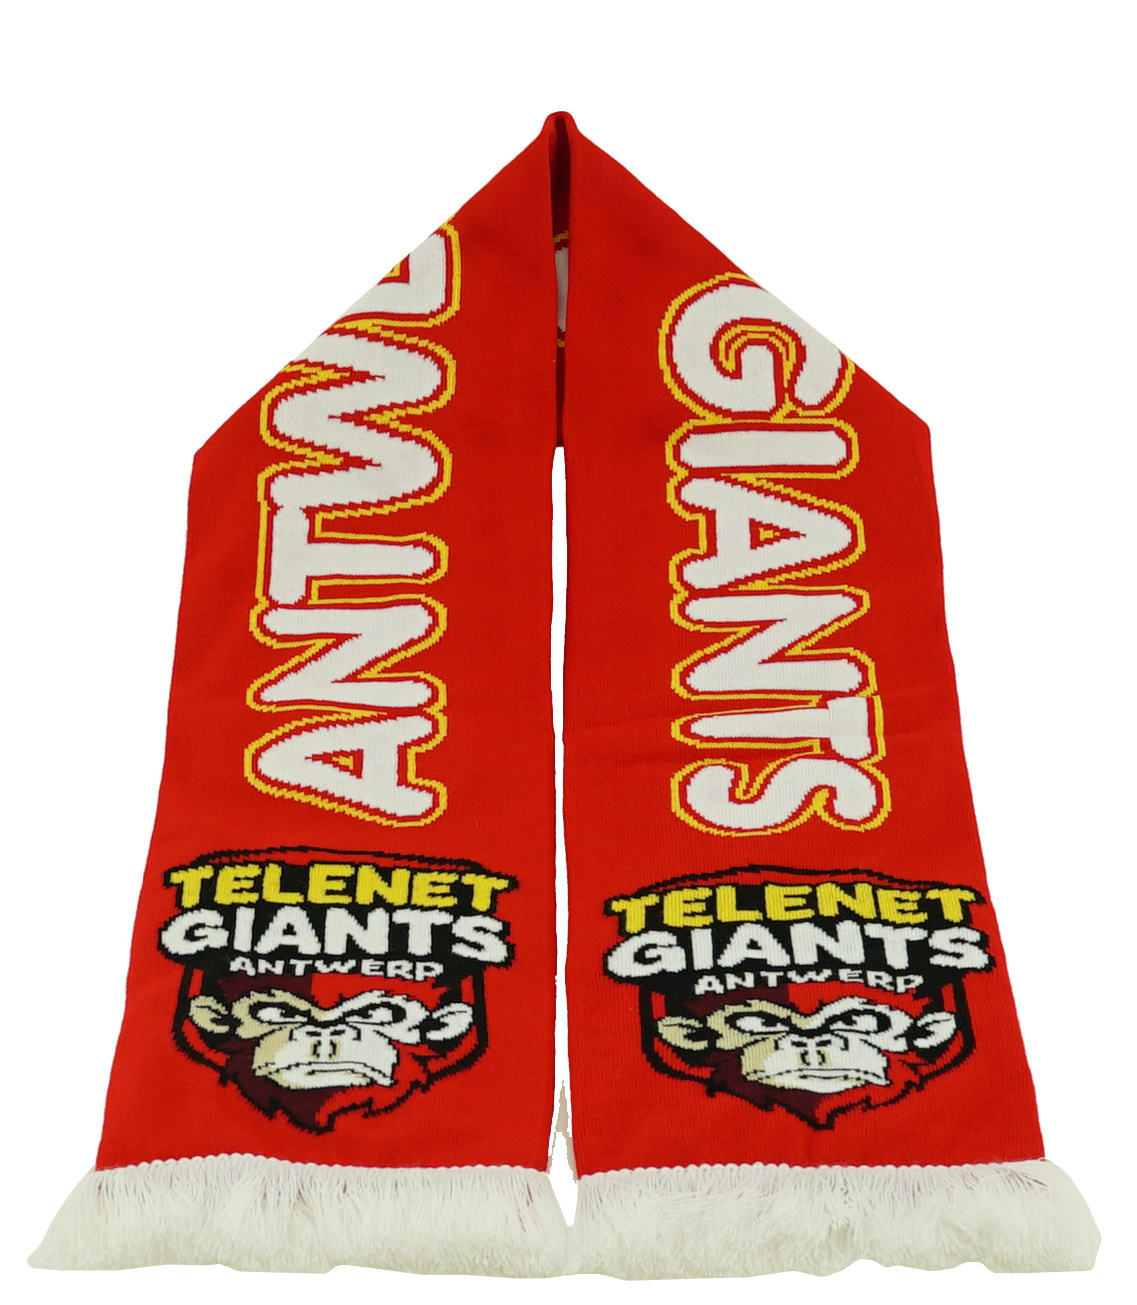 Topfanz Scarf logo Antwerp Giants